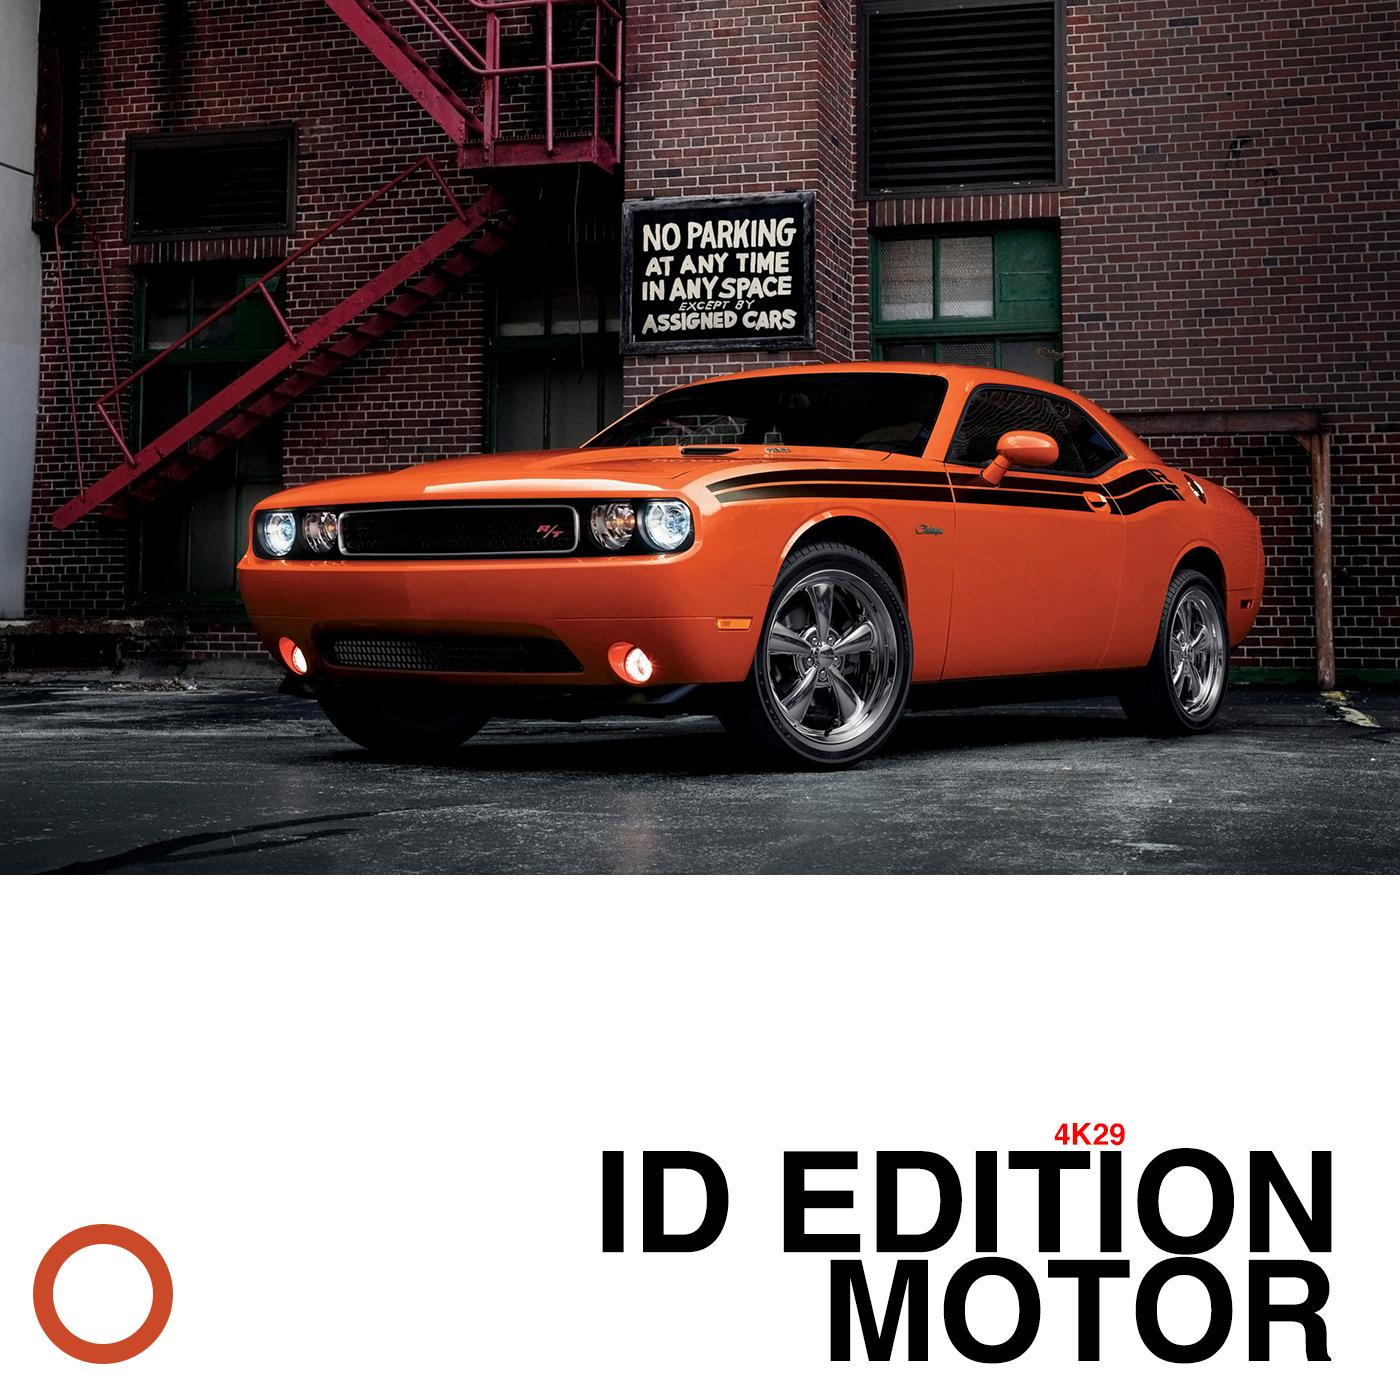 ID EDITION MOTOR 4K29